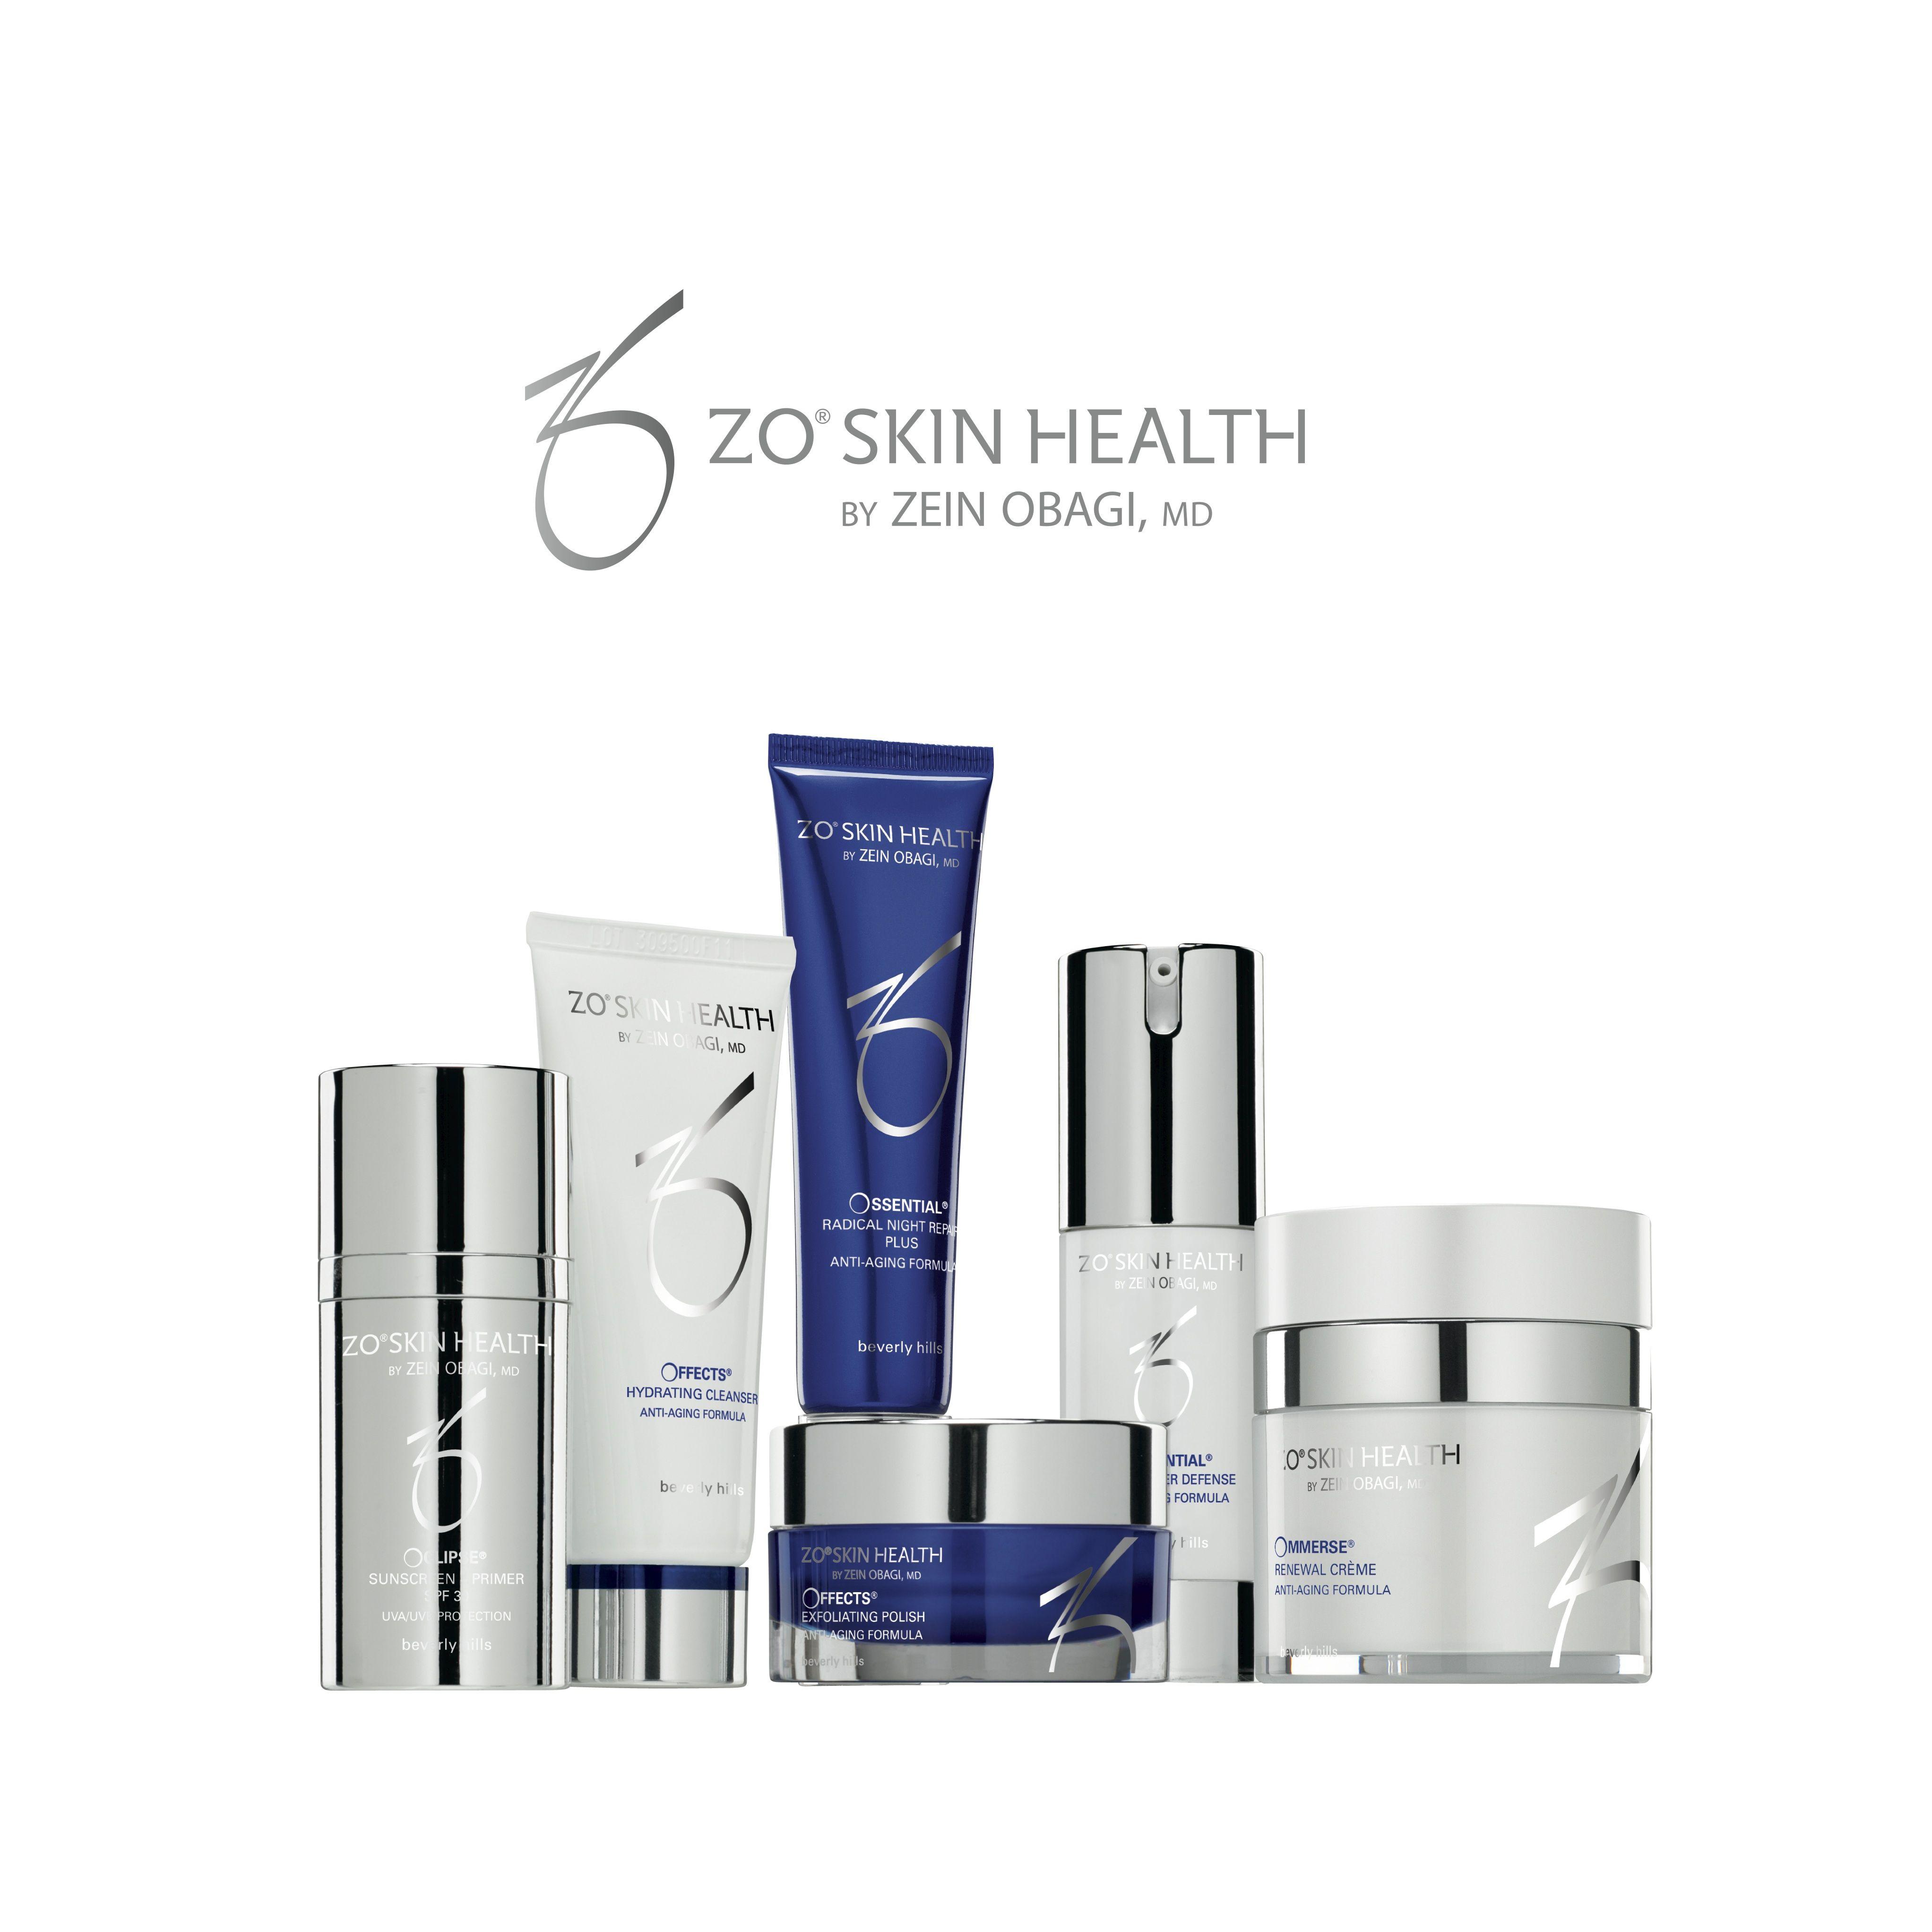 Zo Skin Care Line Locate Zo Skin Health Products And Reviews Of The Best Zo Skin Health Product To Buy T Skin Health Health Snacks For Work Health Skin Care